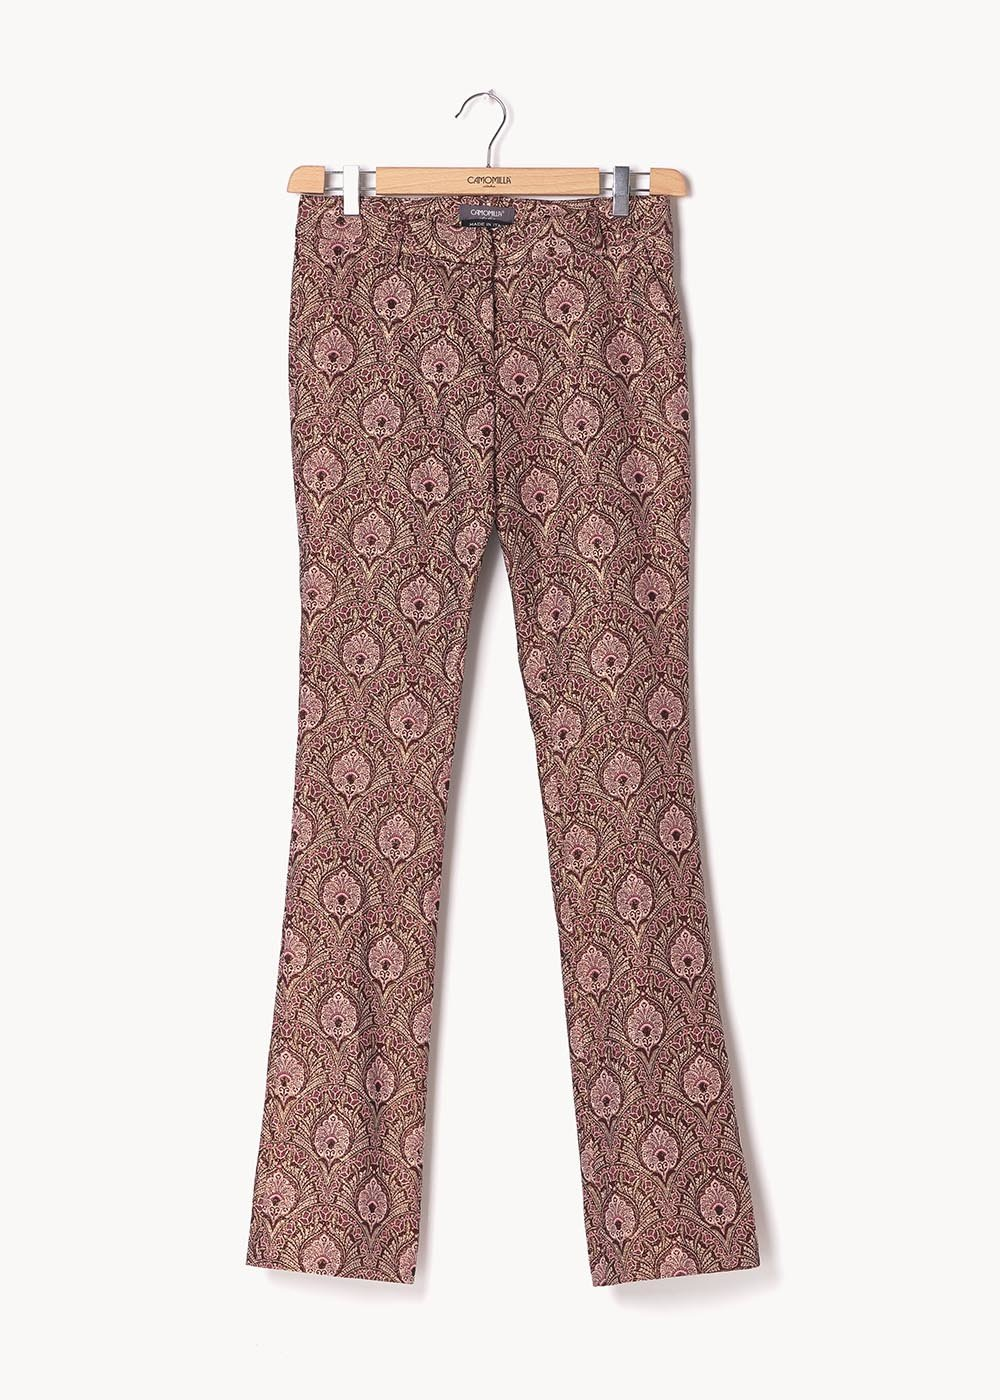 Pantalone modello Cindy fantasia damascata - Ciliegia /  Sepia Fantasia - Donna